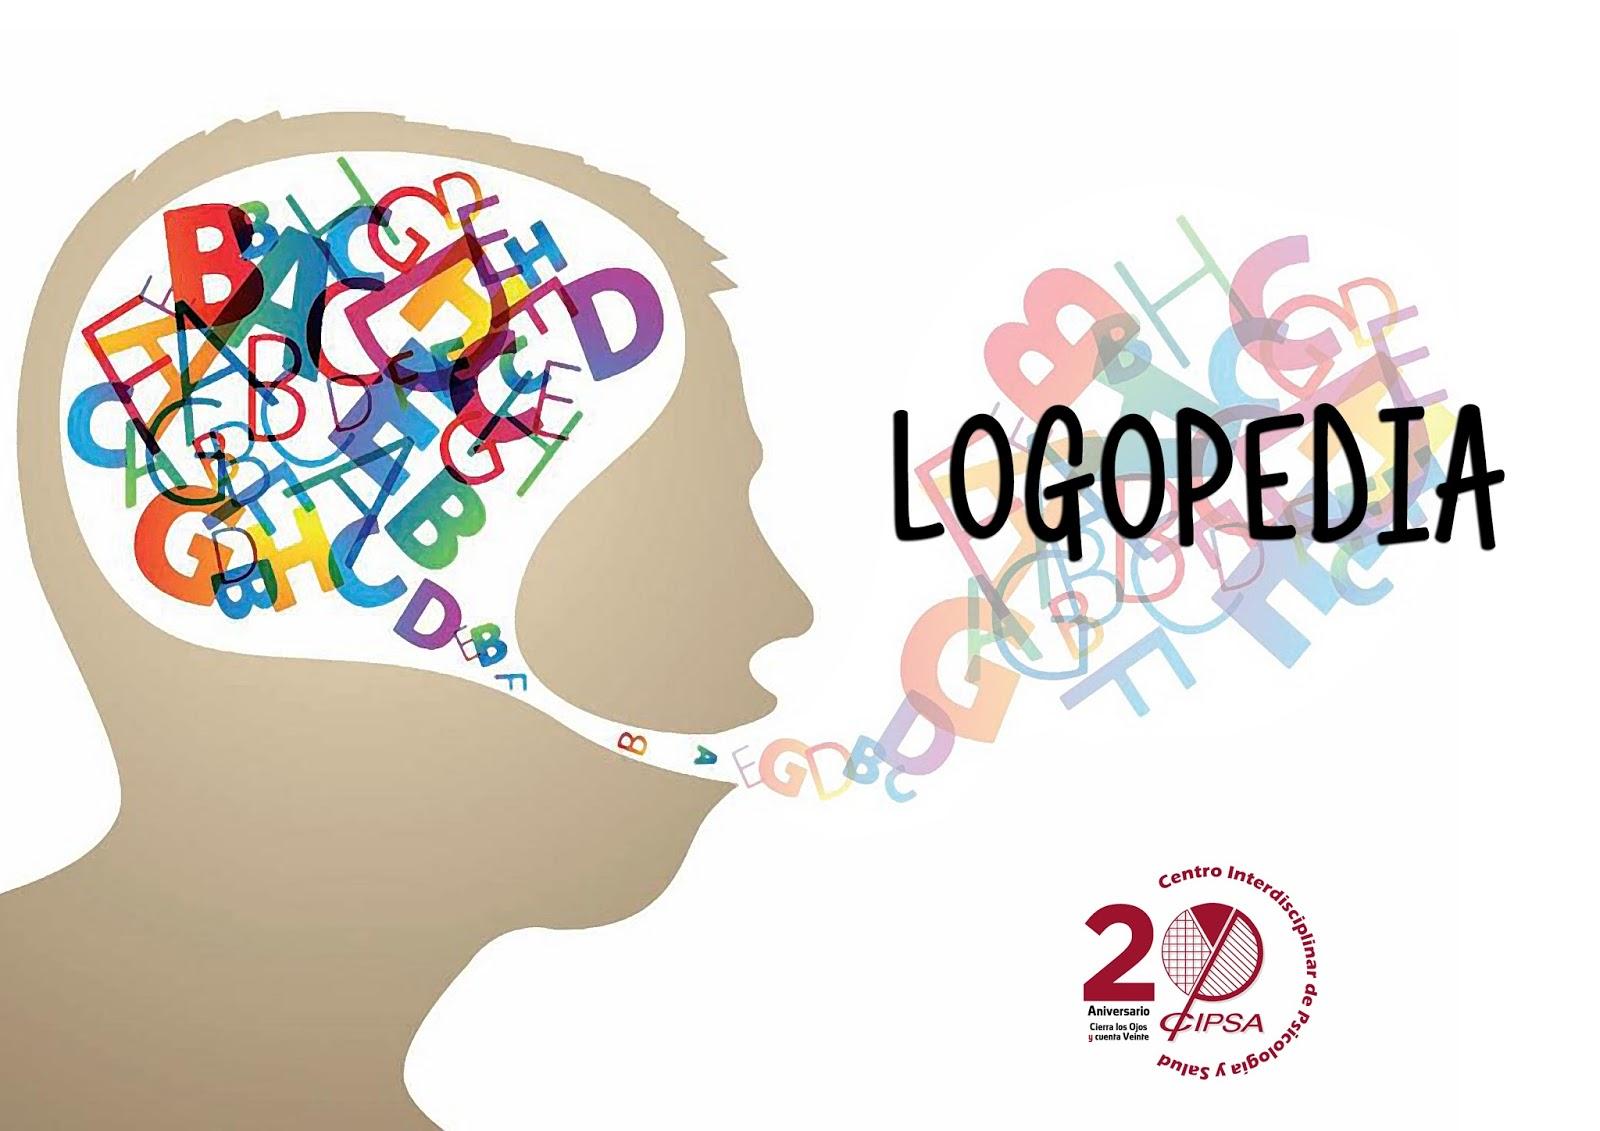 Esclerodiario empp - emsp: Logopedia en esclerosis múltiple